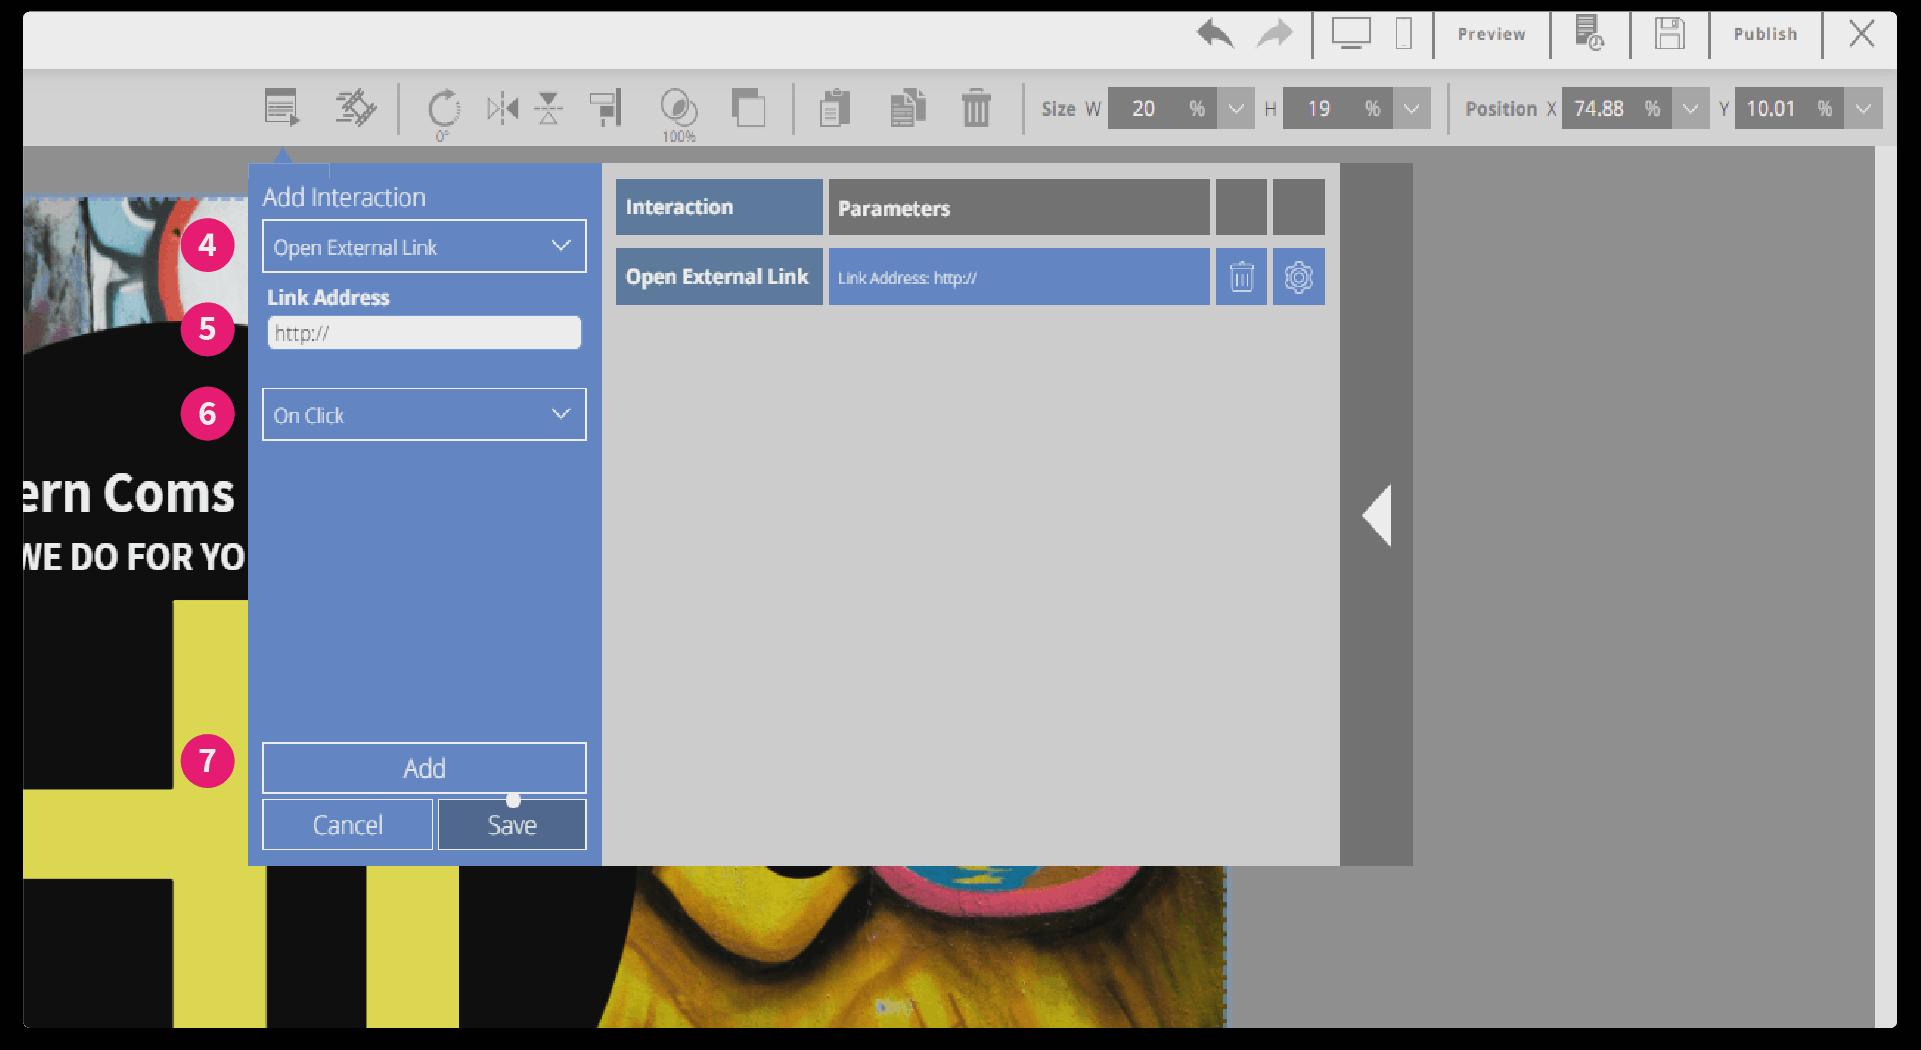 screenshot of button interaction window